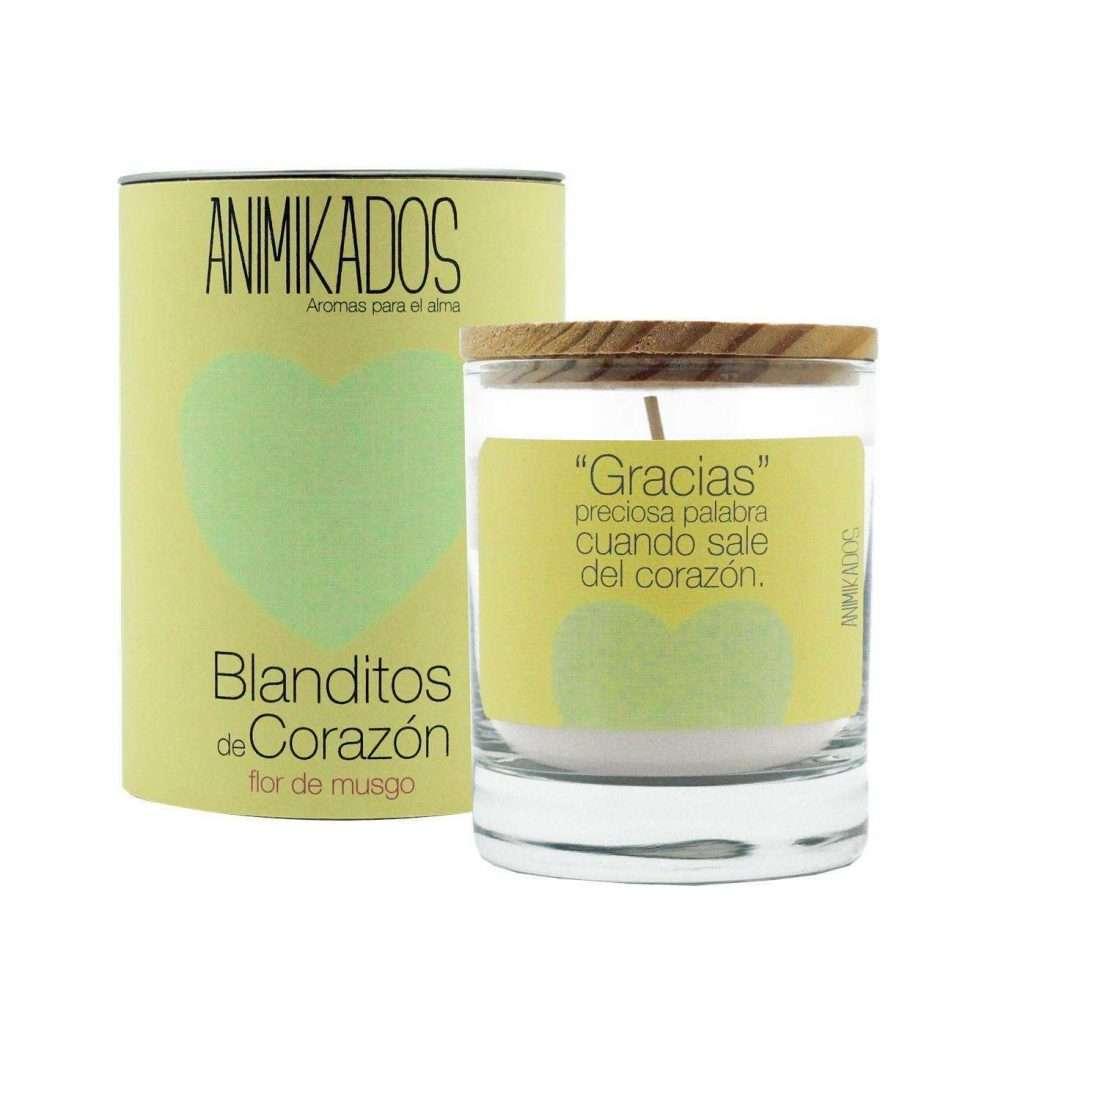 8436551849058 Vv007bcam Blanditos De Corazón 01